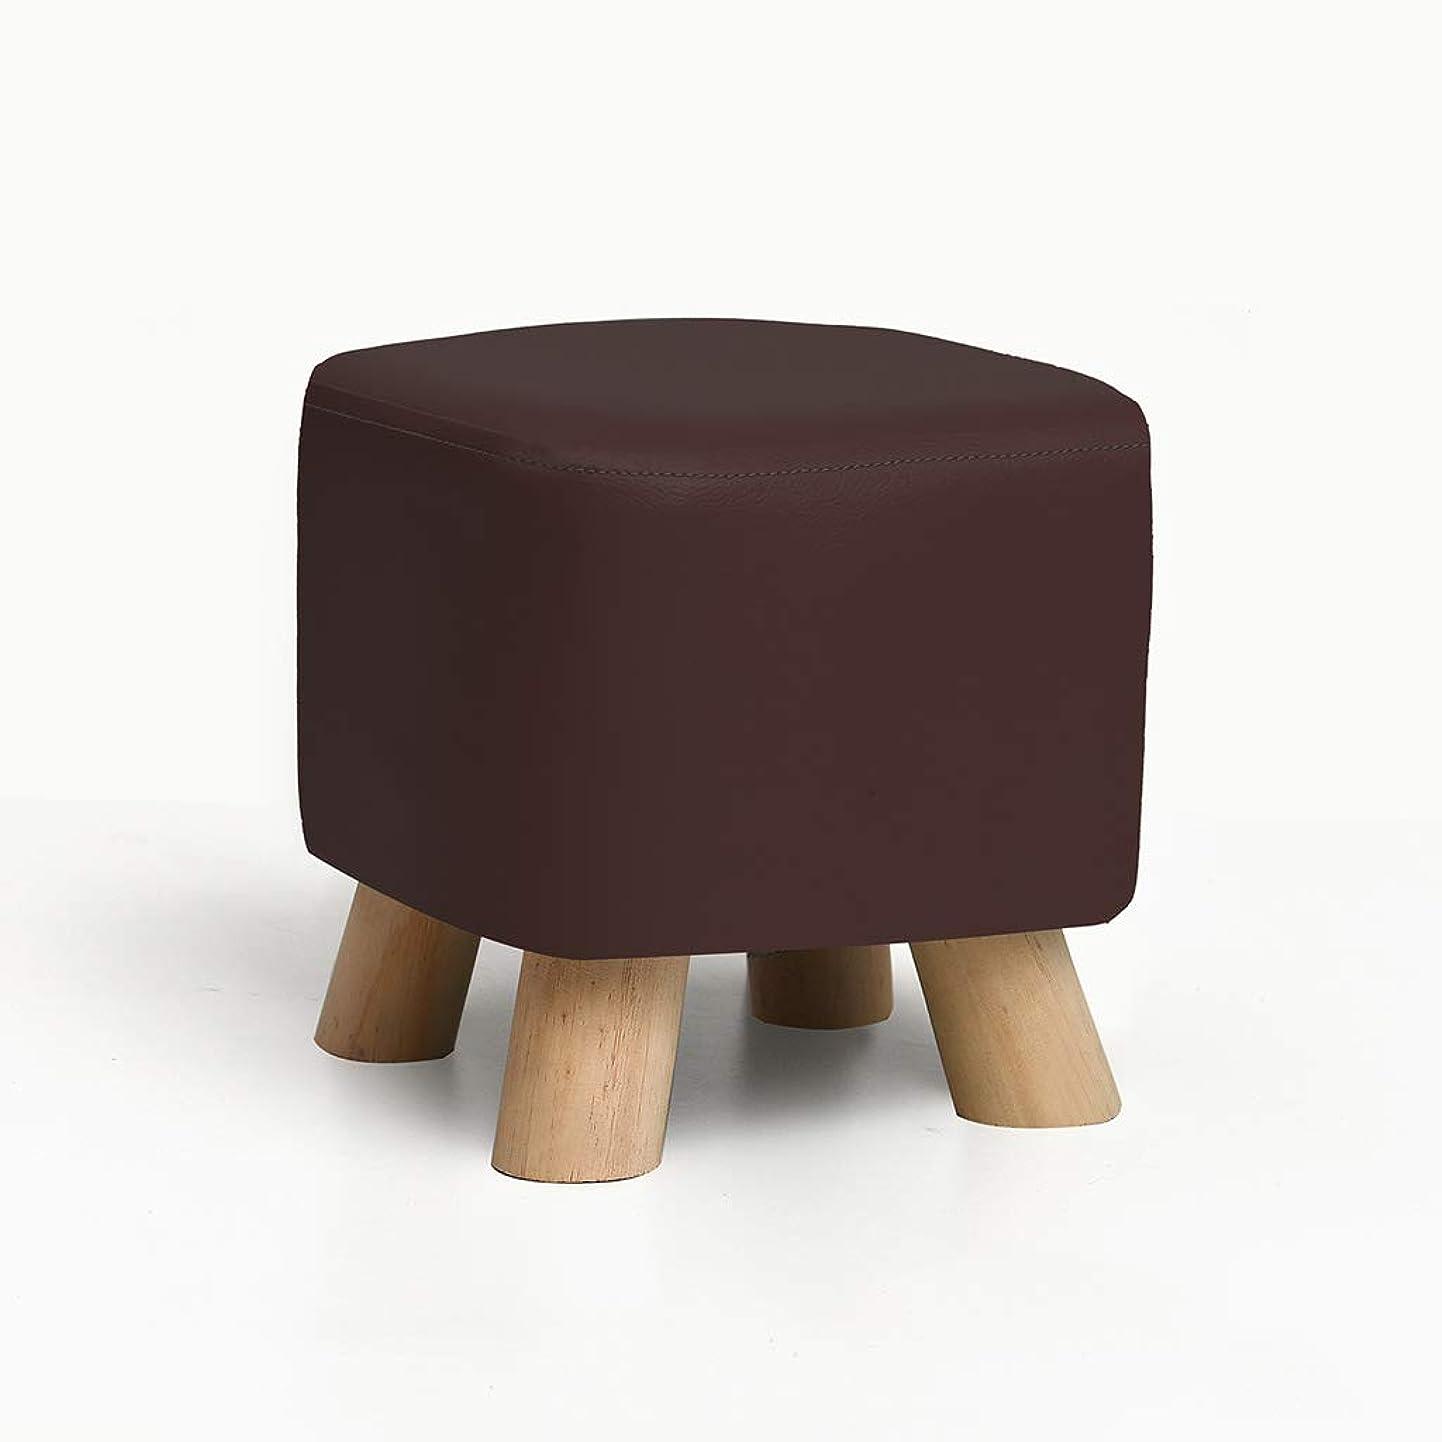 MLMHLMR Solid Wood Shoes Bench Fashion Shoes Stool Creative Square Stool Fabric Stool Stool Sofa Stool Coffee Table Bench Home Stool Stool (Color : Brown) mqqbpfqlgjf9